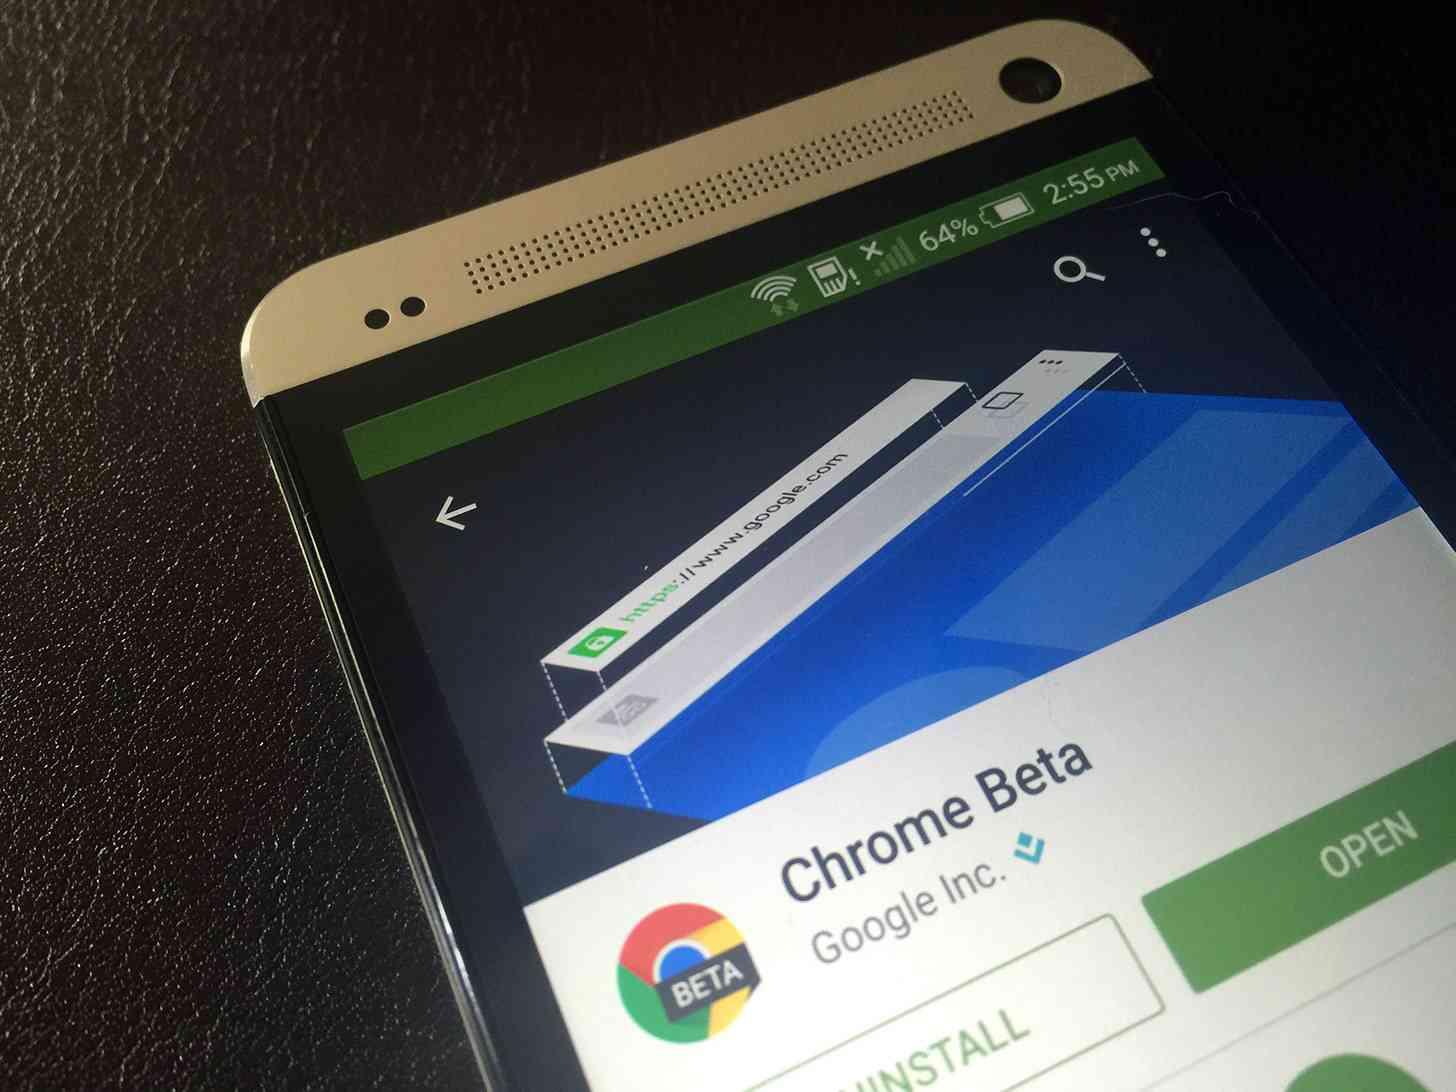 Chrome Beta Google Play store